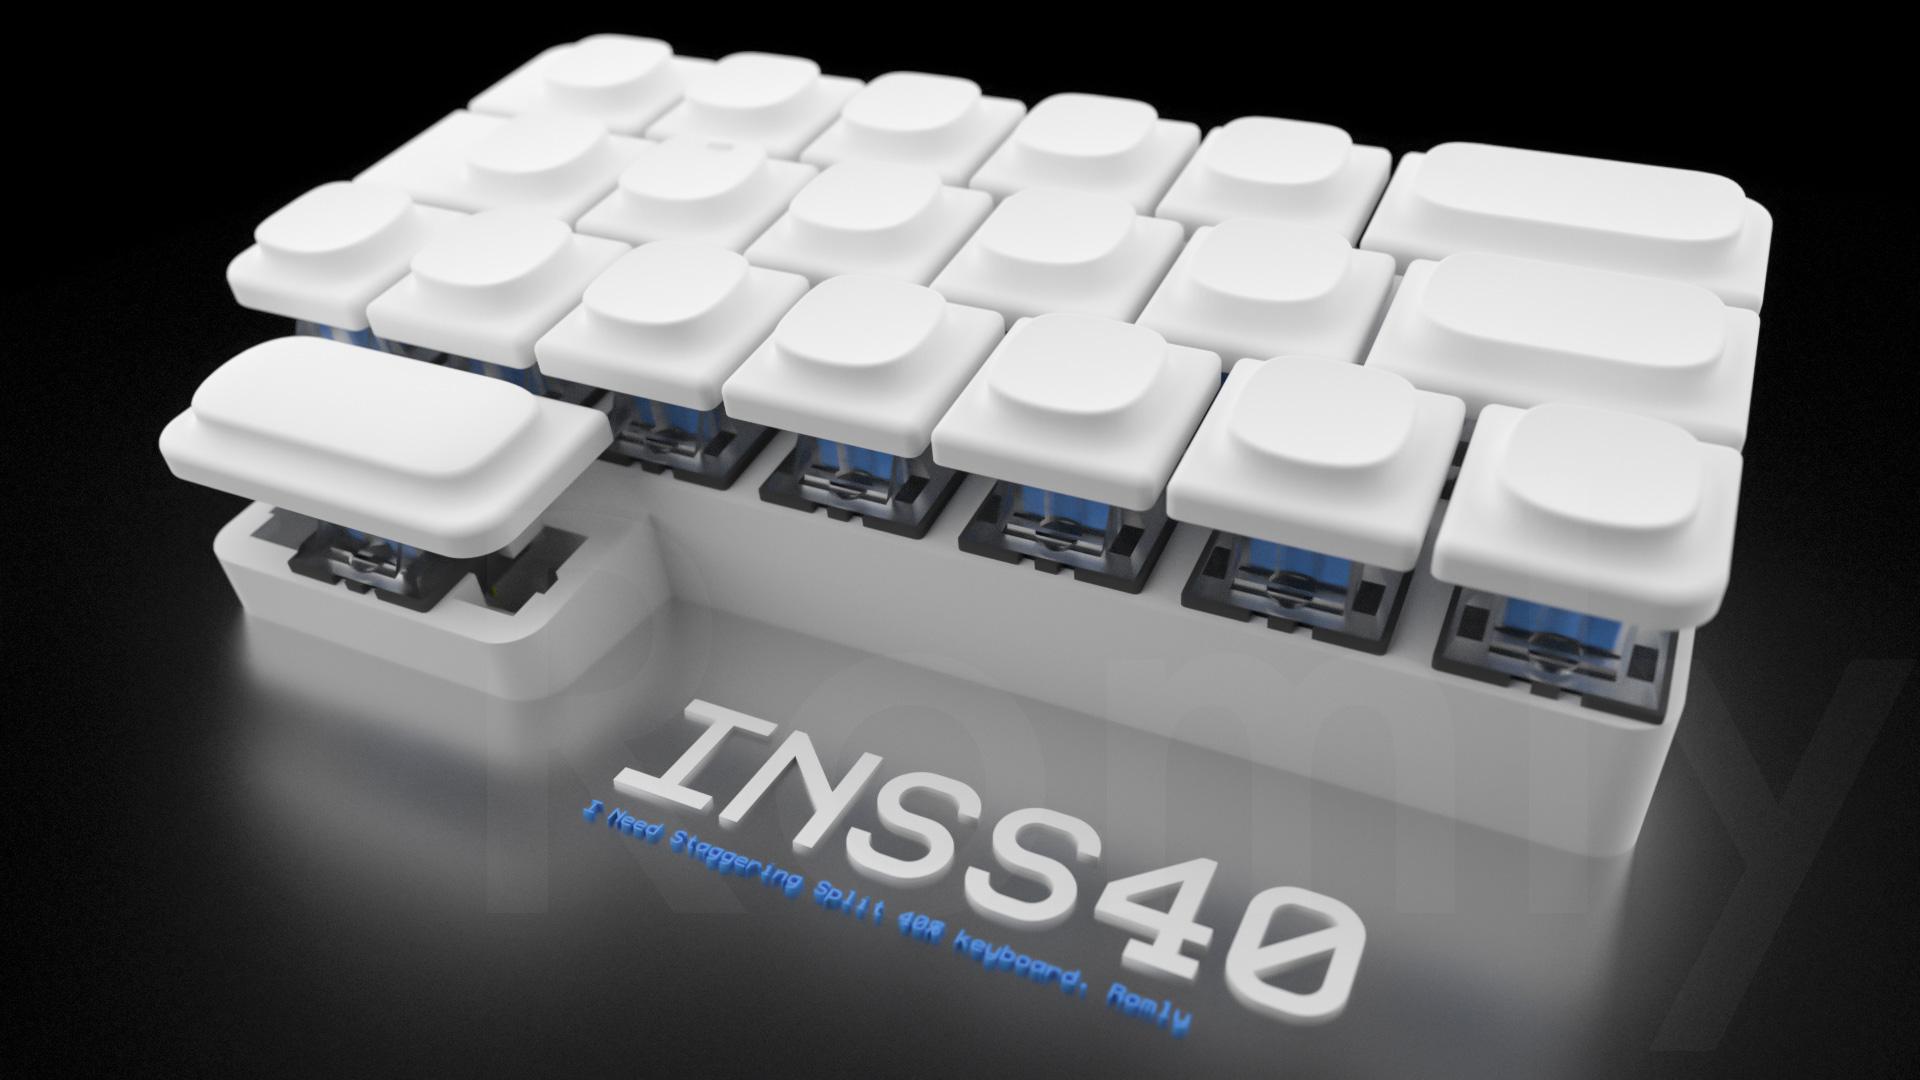 INSS40 design